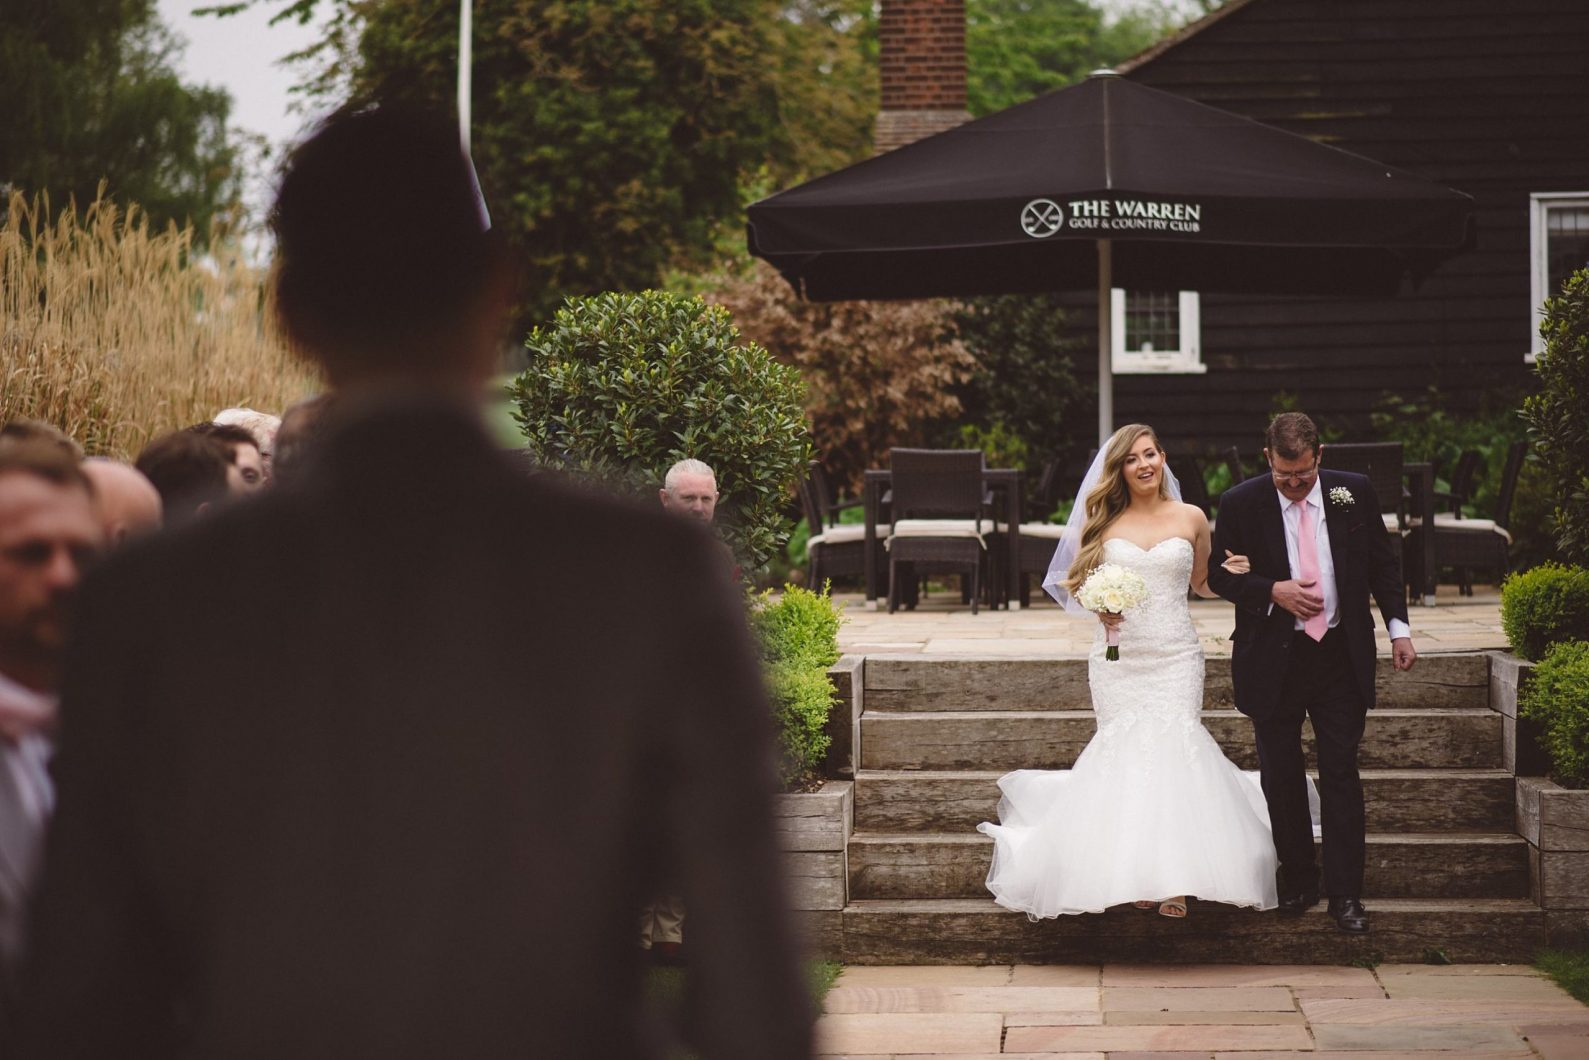 The Warren Estate wedding venue